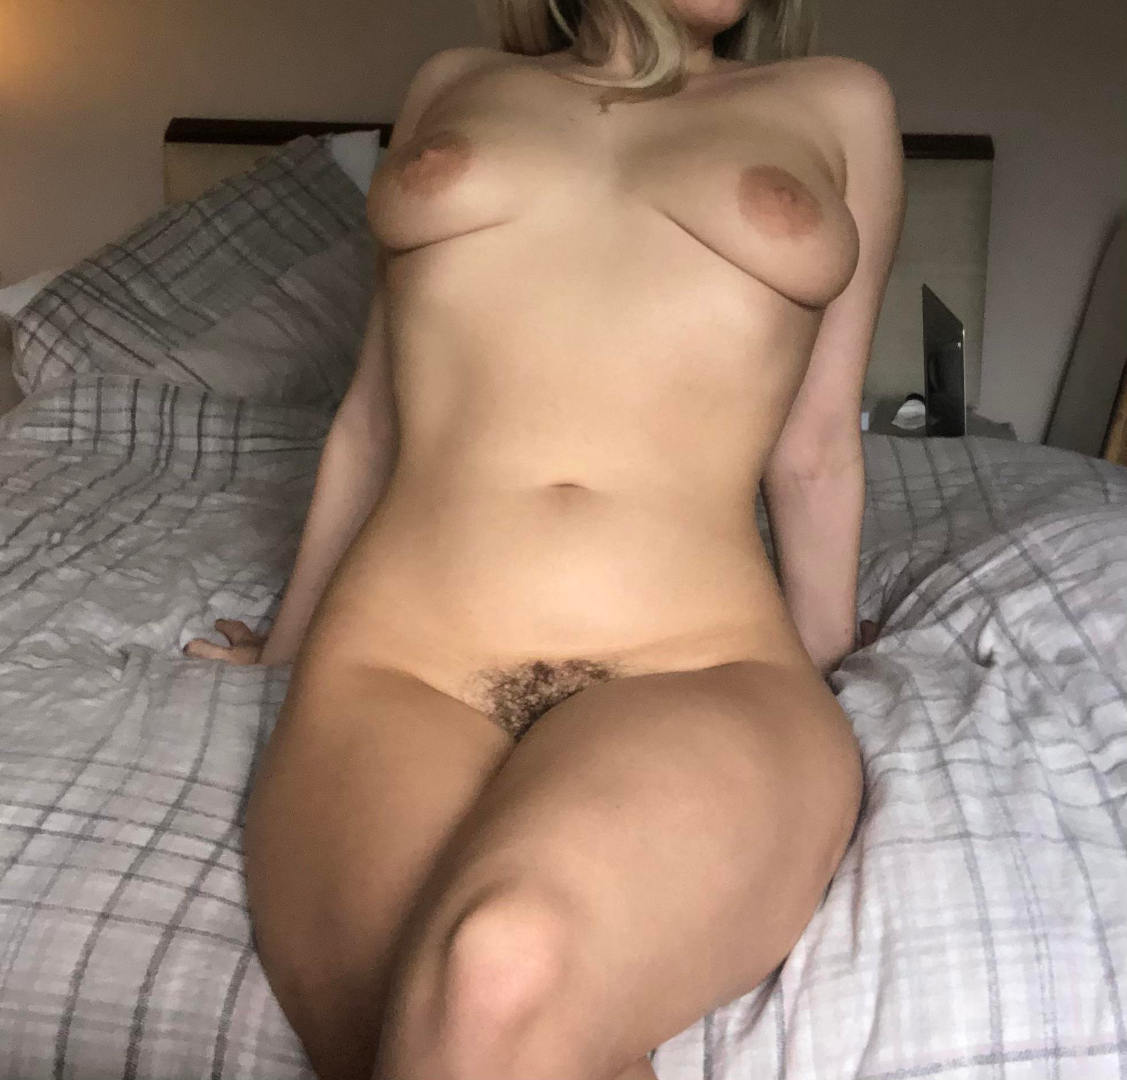 naked girls leaked 100